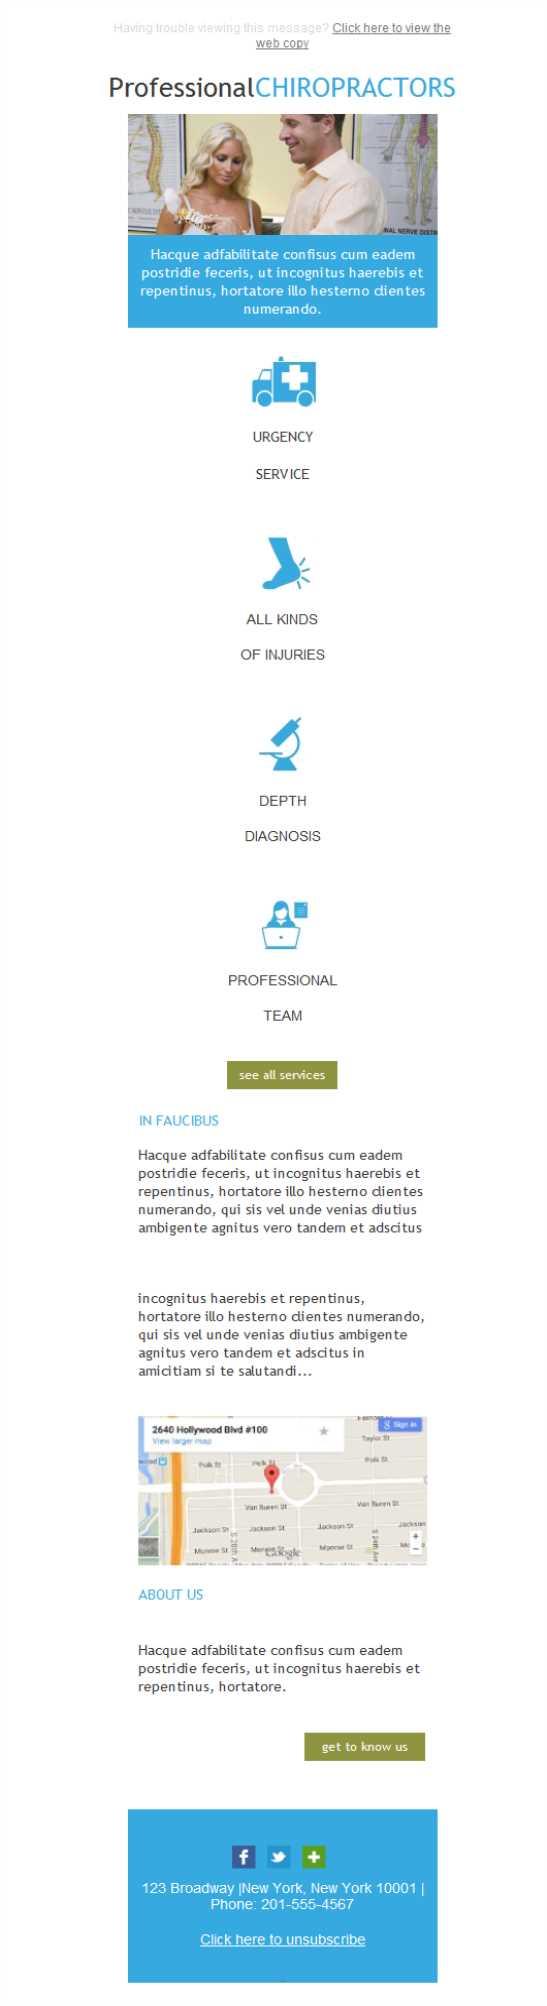 Dorable Plantillas De Quiropráctica Composición - Colección De ...